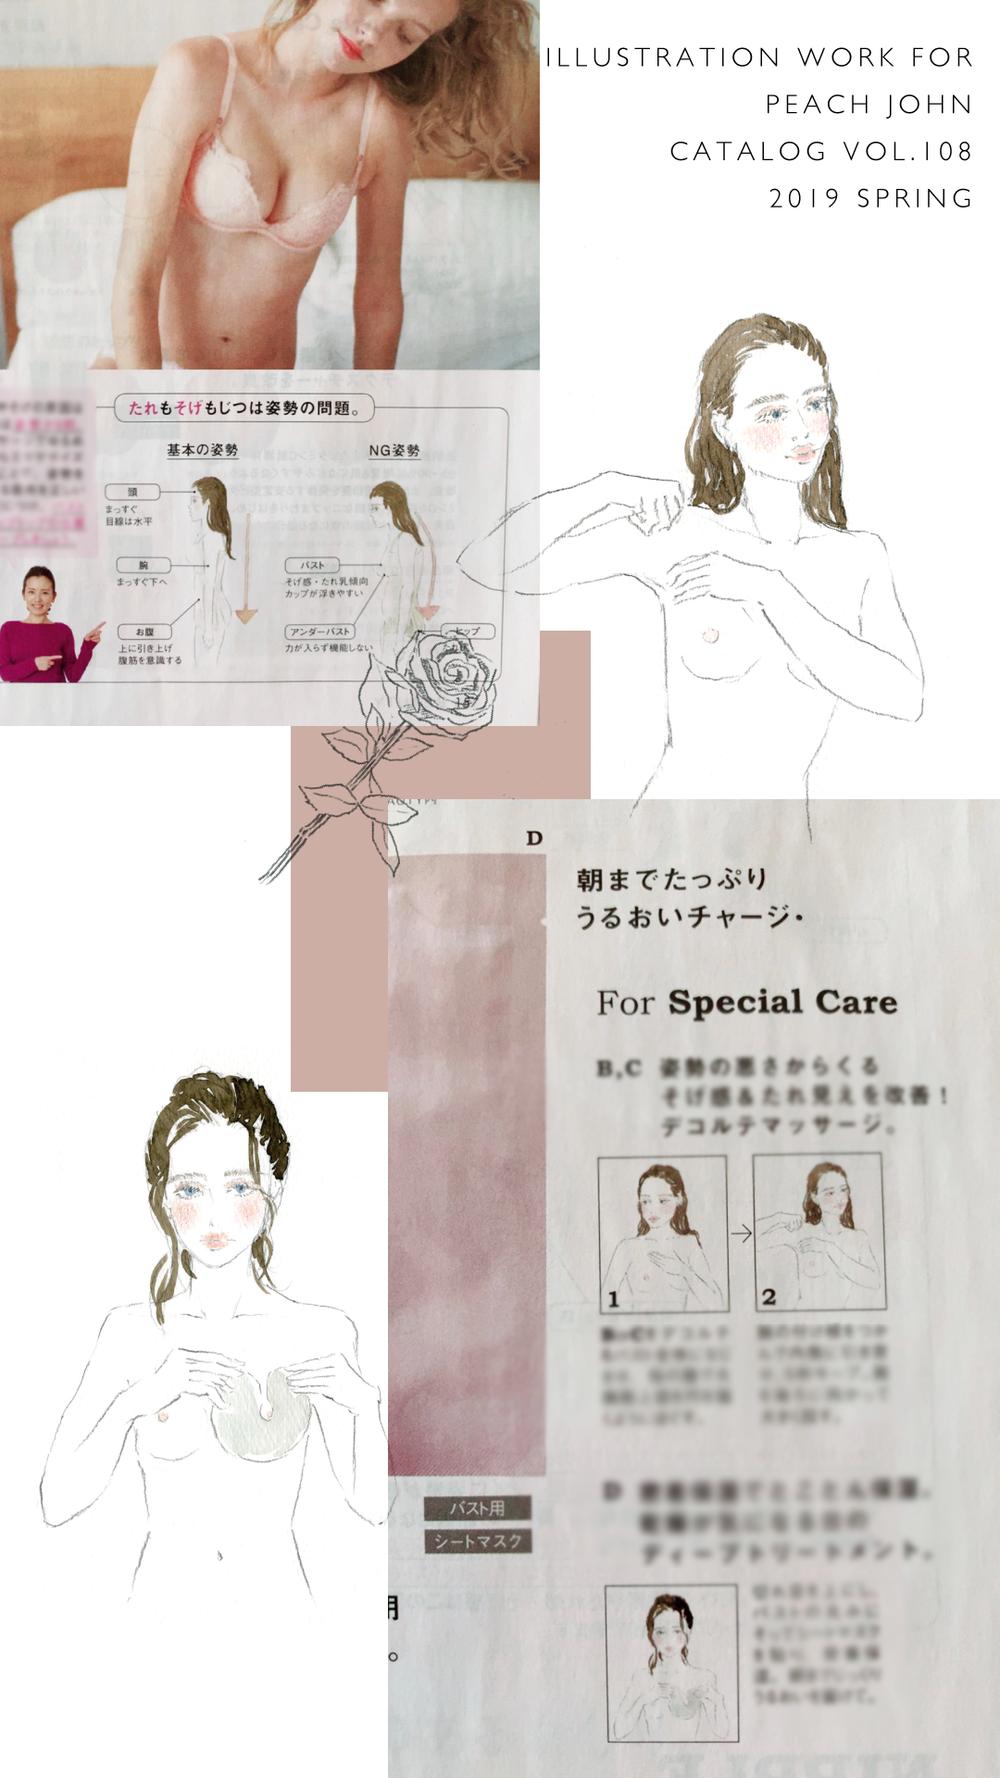 PEACHJOHN-_2019spring_vol108_yurikooyamaillustration_stories3.png